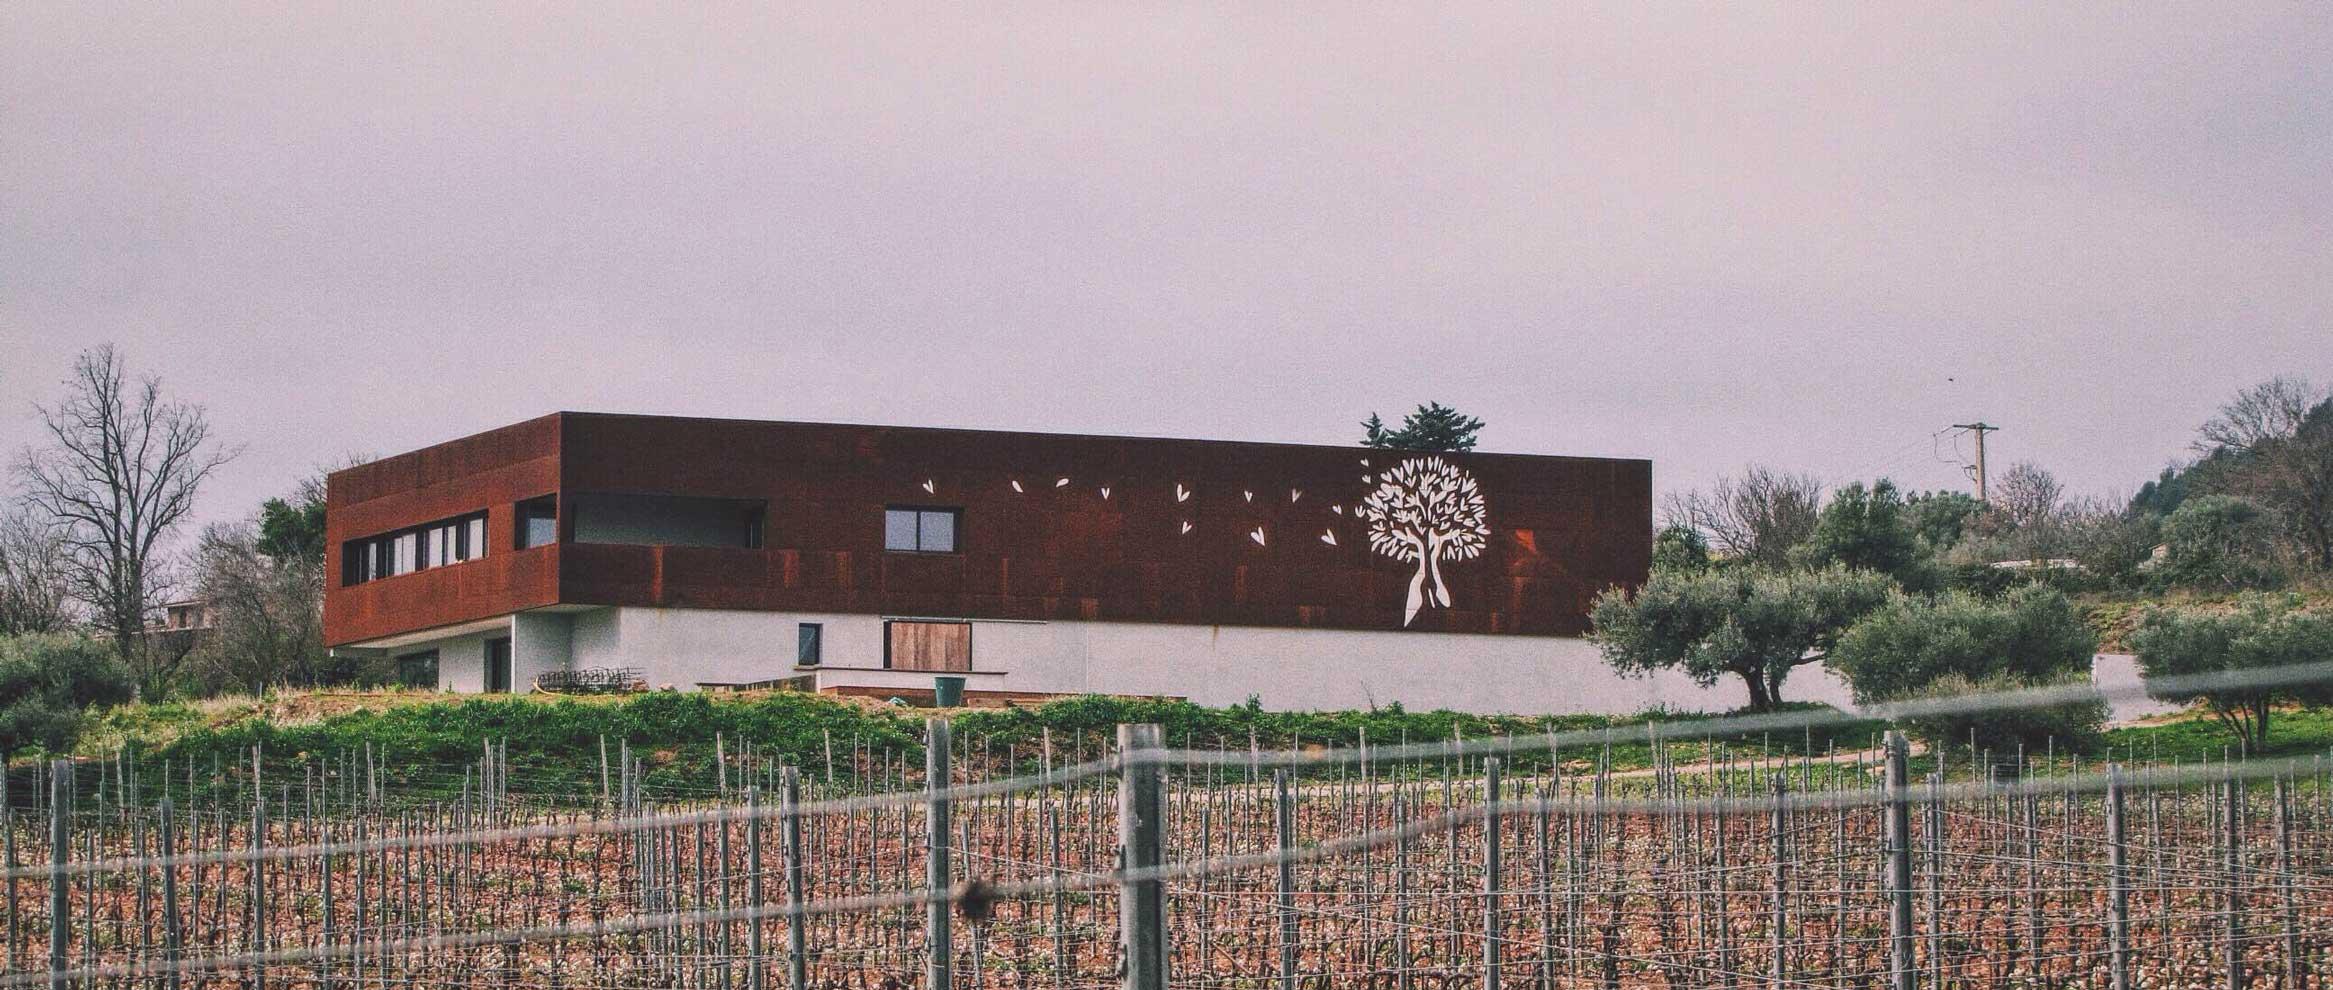 domaine viticole hermitage saint martin cuers